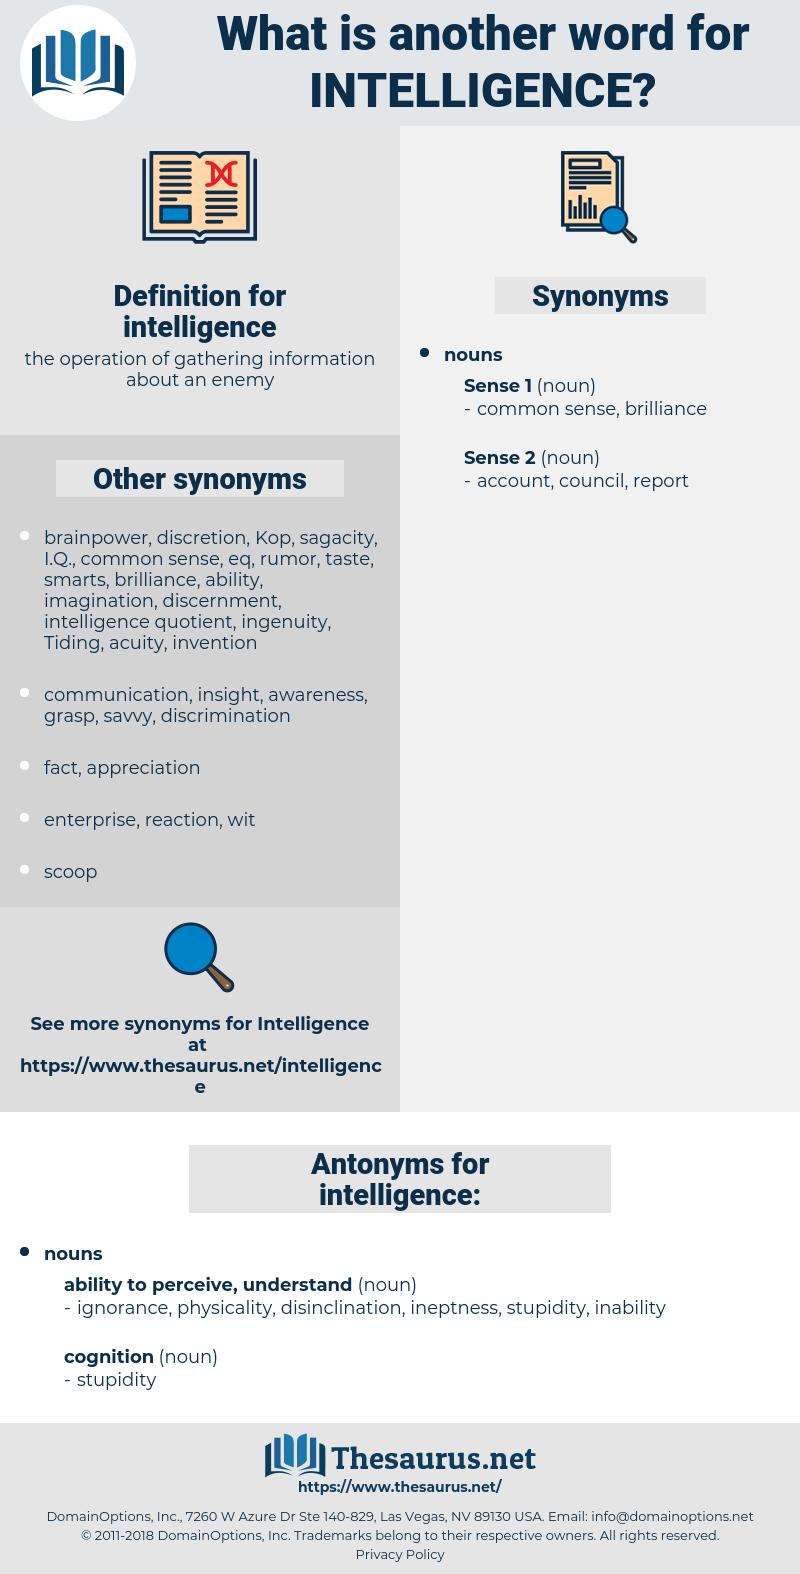 intelligence, synonym intelligence, another word for intelligence, words like intelligence, thesaurus intelligence